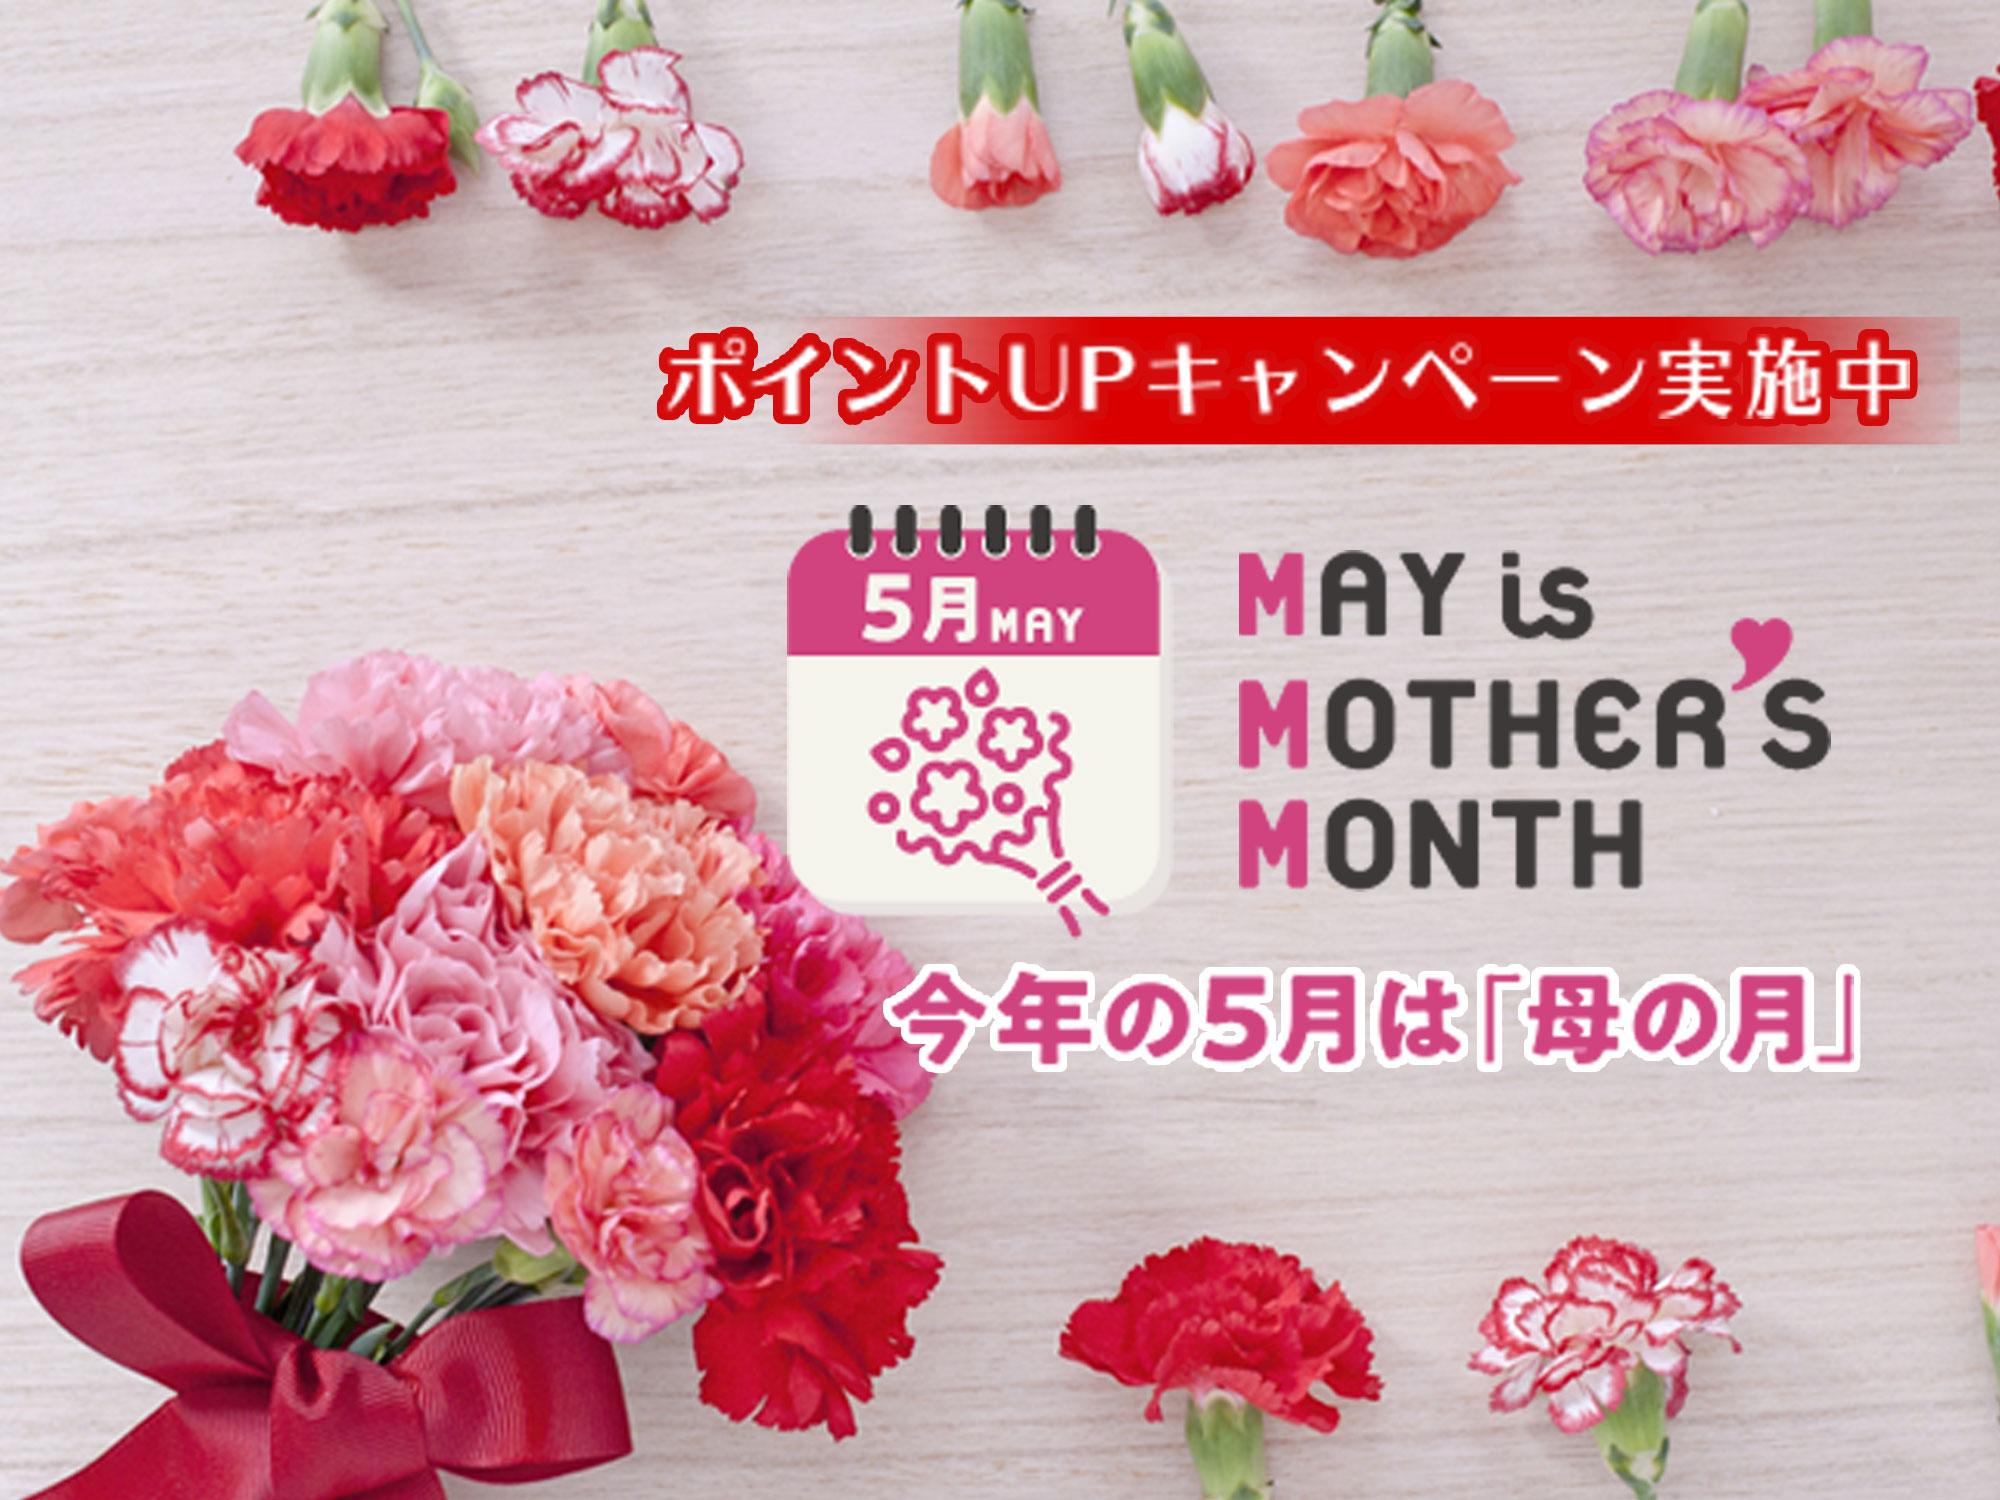 天満屋岡山本店母の日大好評開催中!